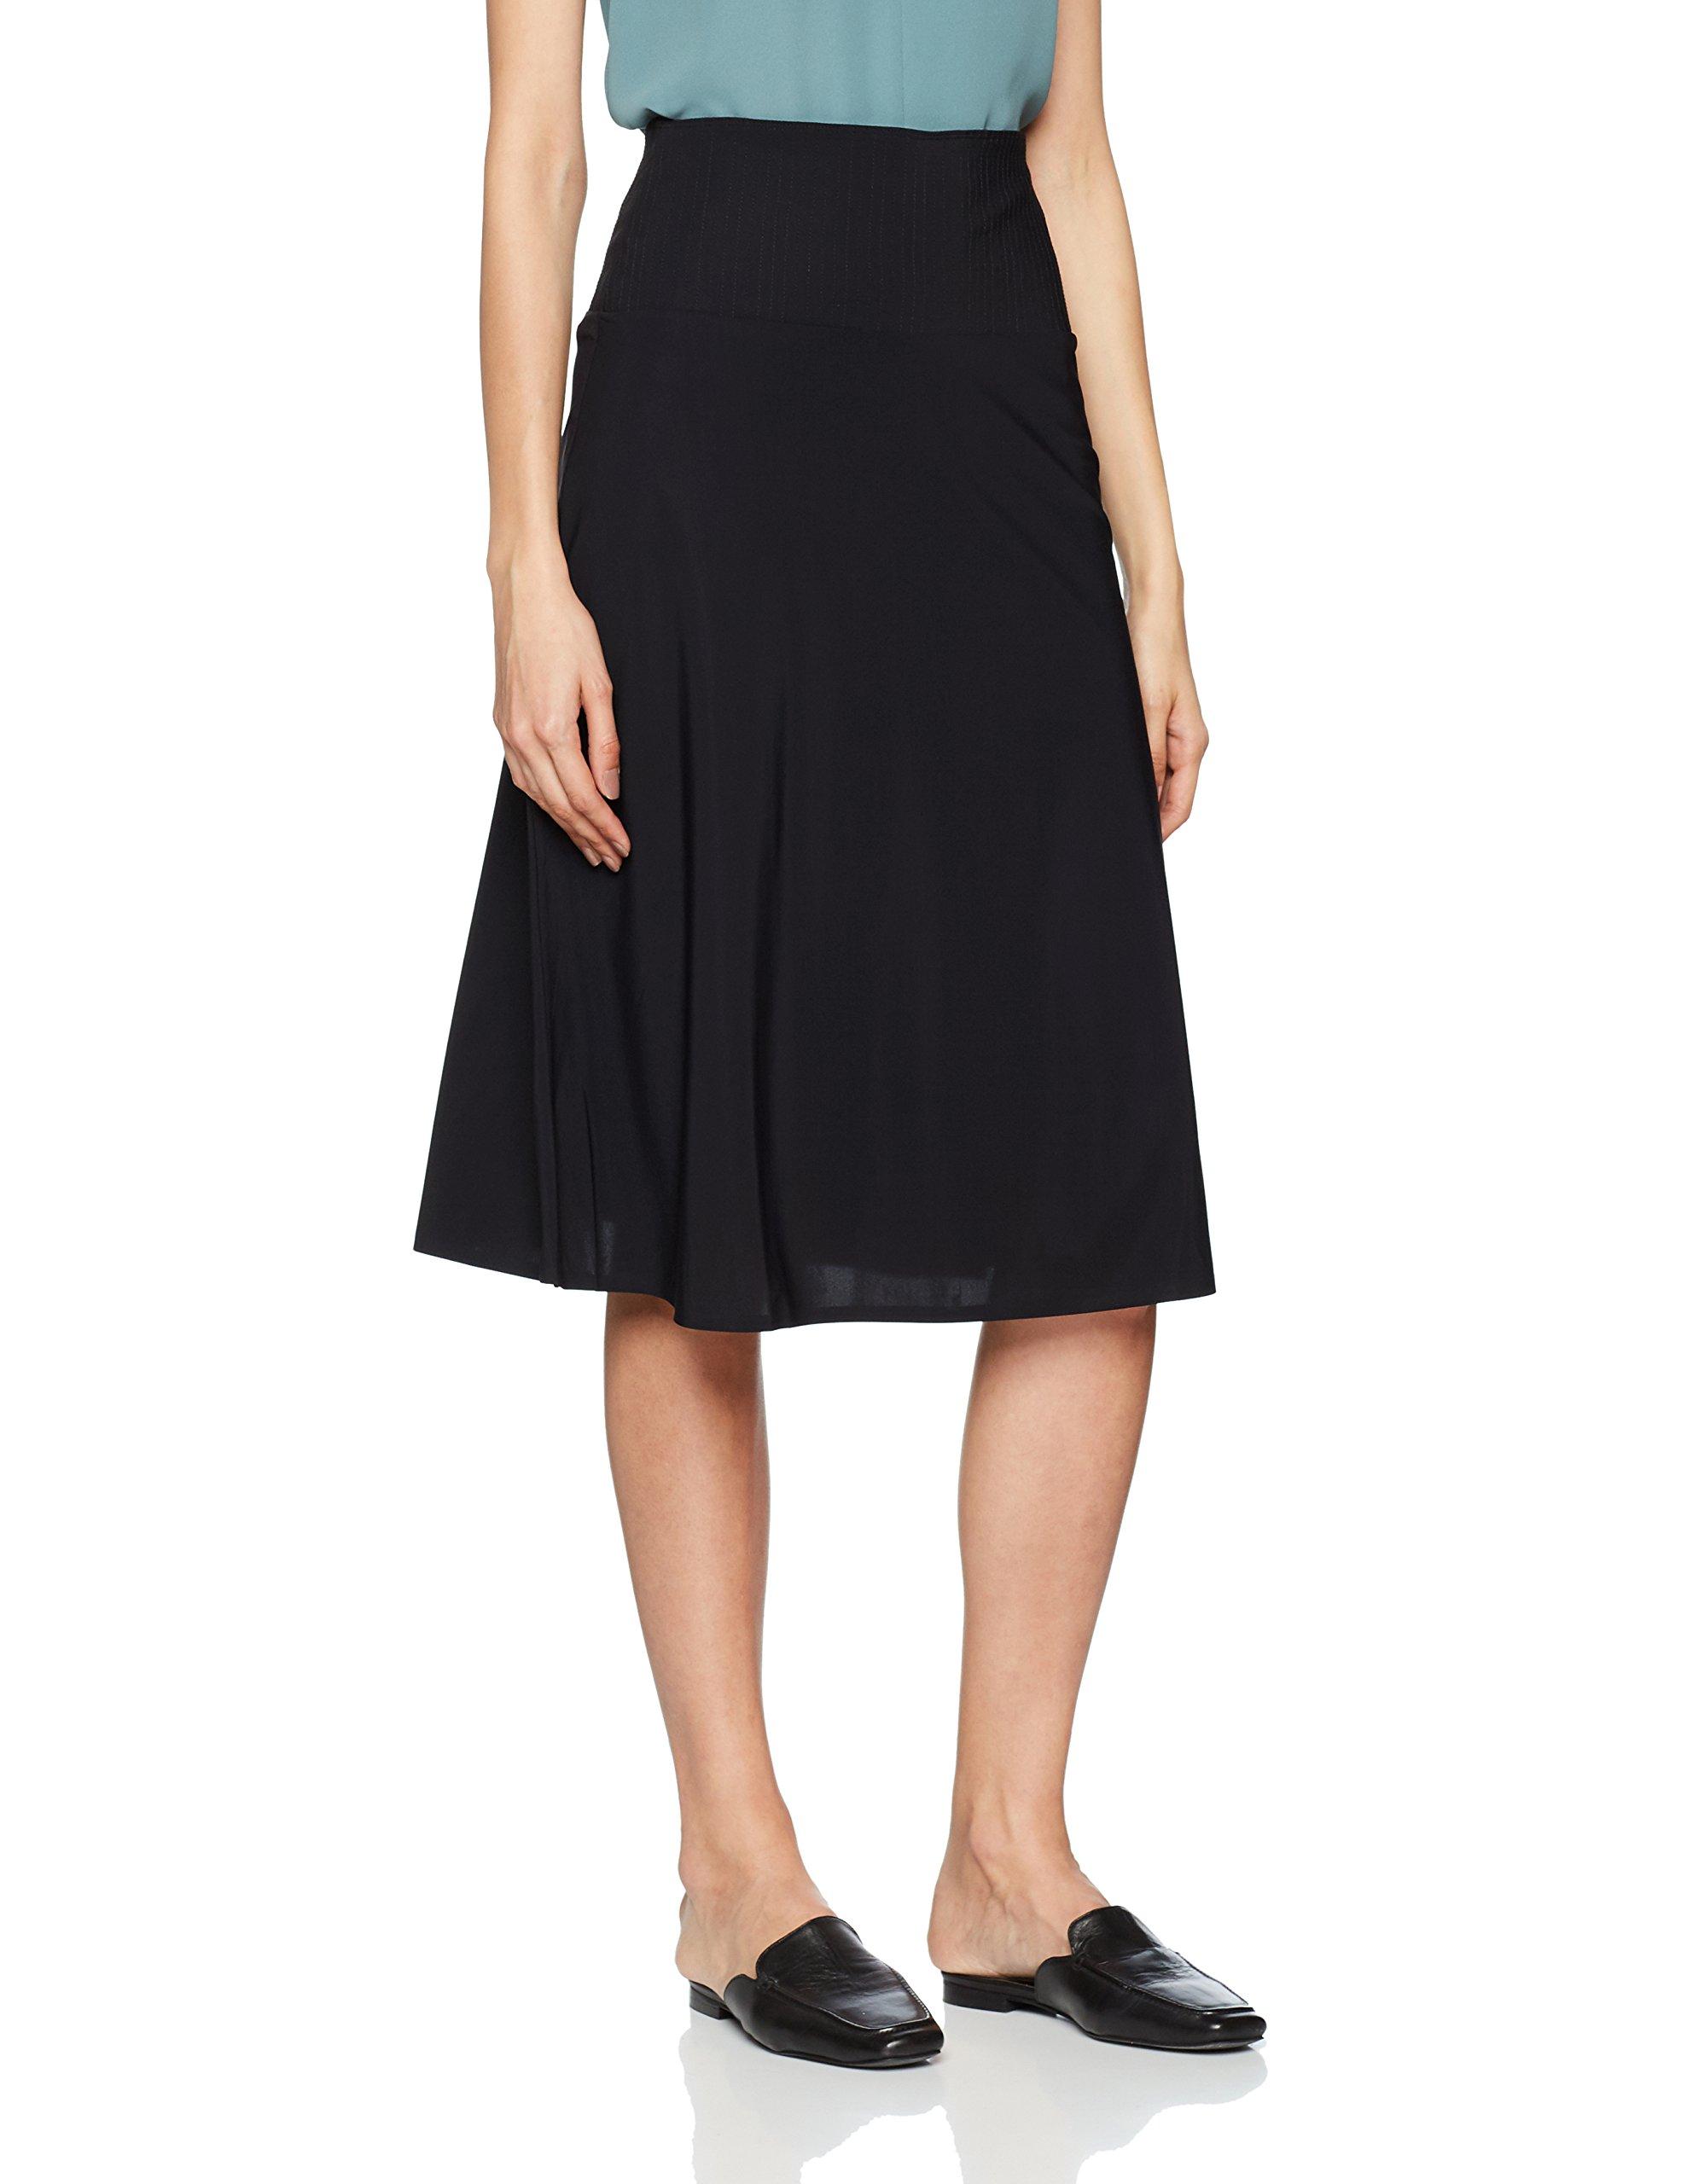 Filippa Waisted K High Skirt JupeNoirblack40taille Jersey FabricantLargeFemme hQtodBrCsx